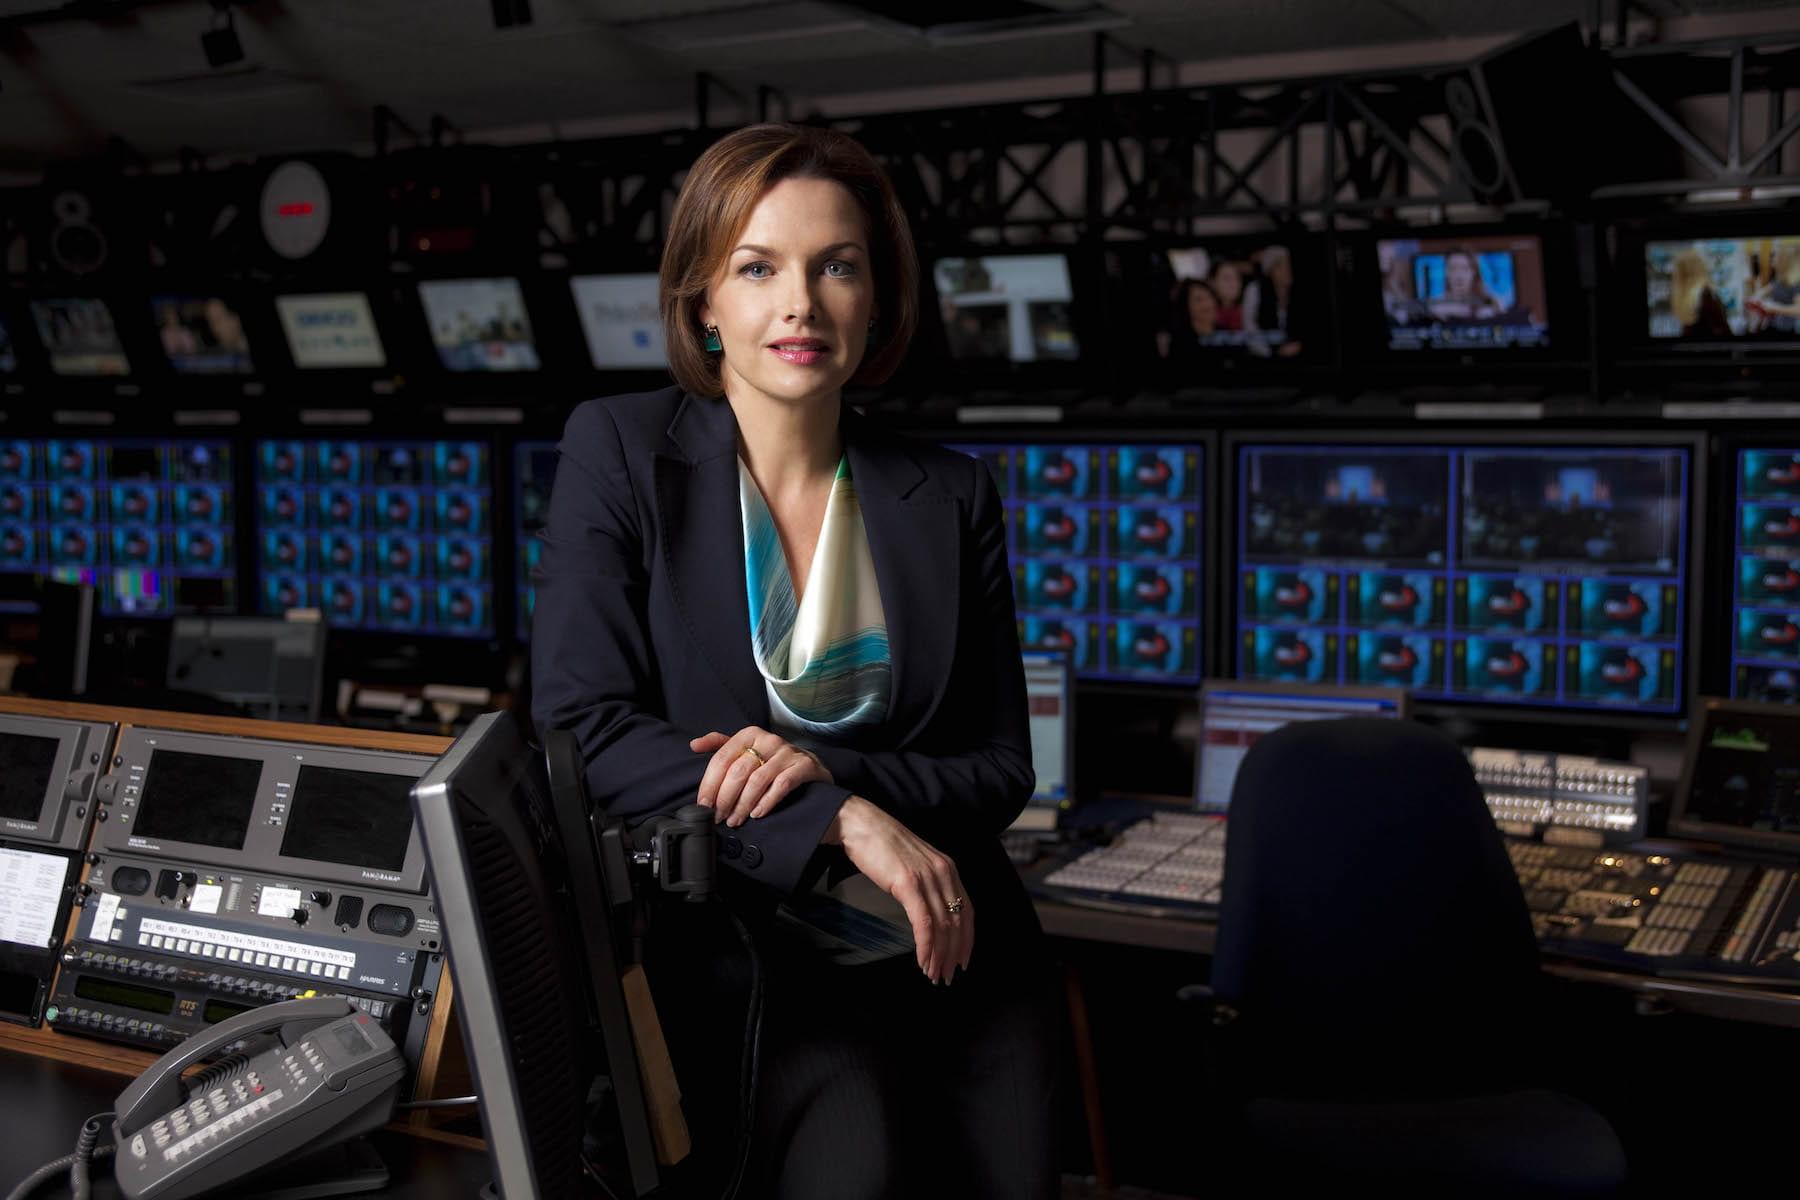 Dawna Friesen in TV news studio